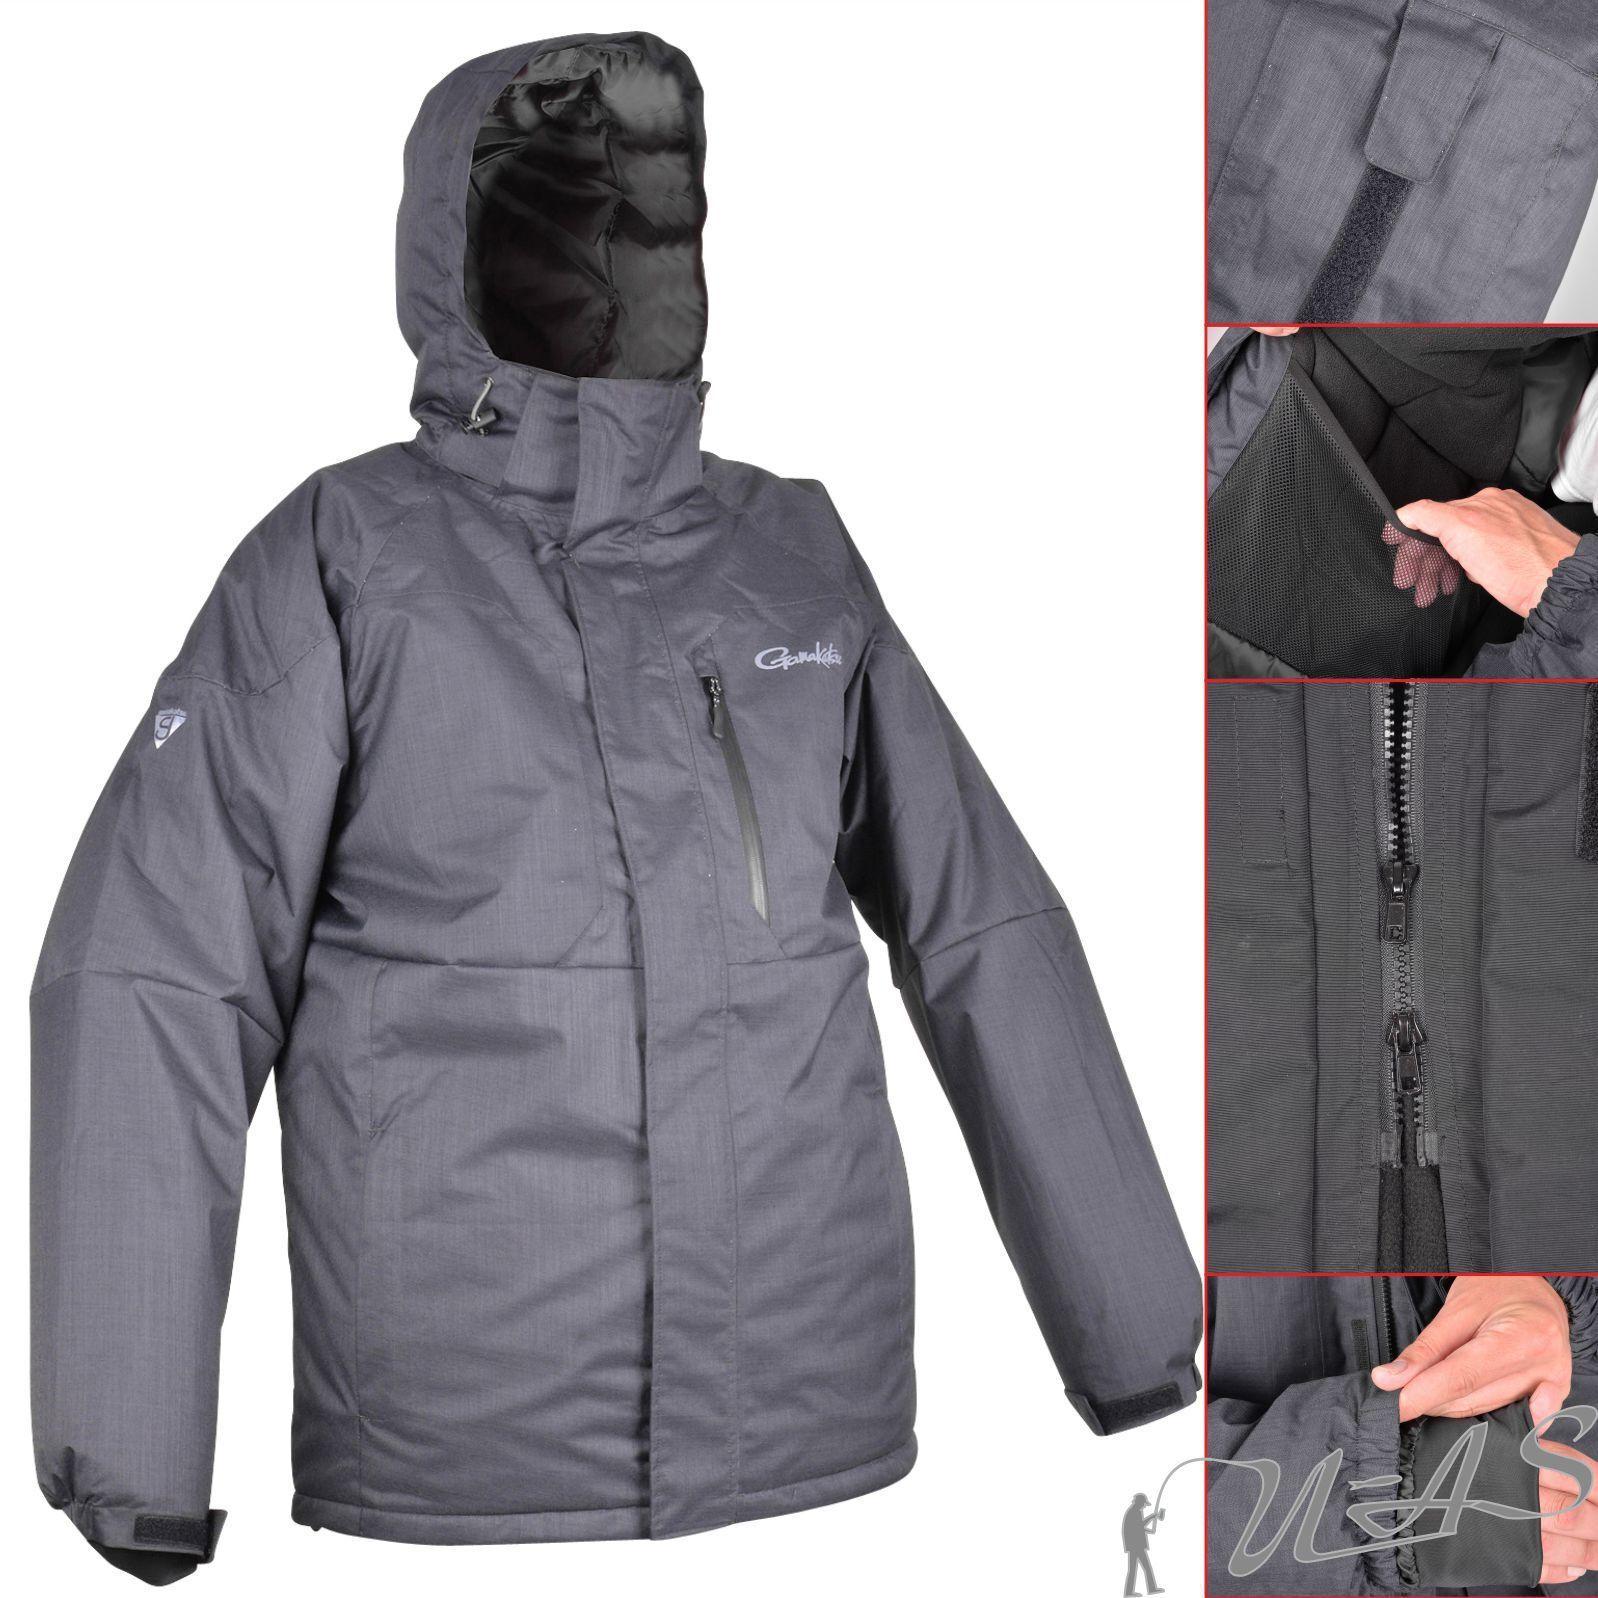 Gamakatsu Thermal Jacket Jacke XXL Zu Thermoanzug Thermal Suits Angel Anzug Sha